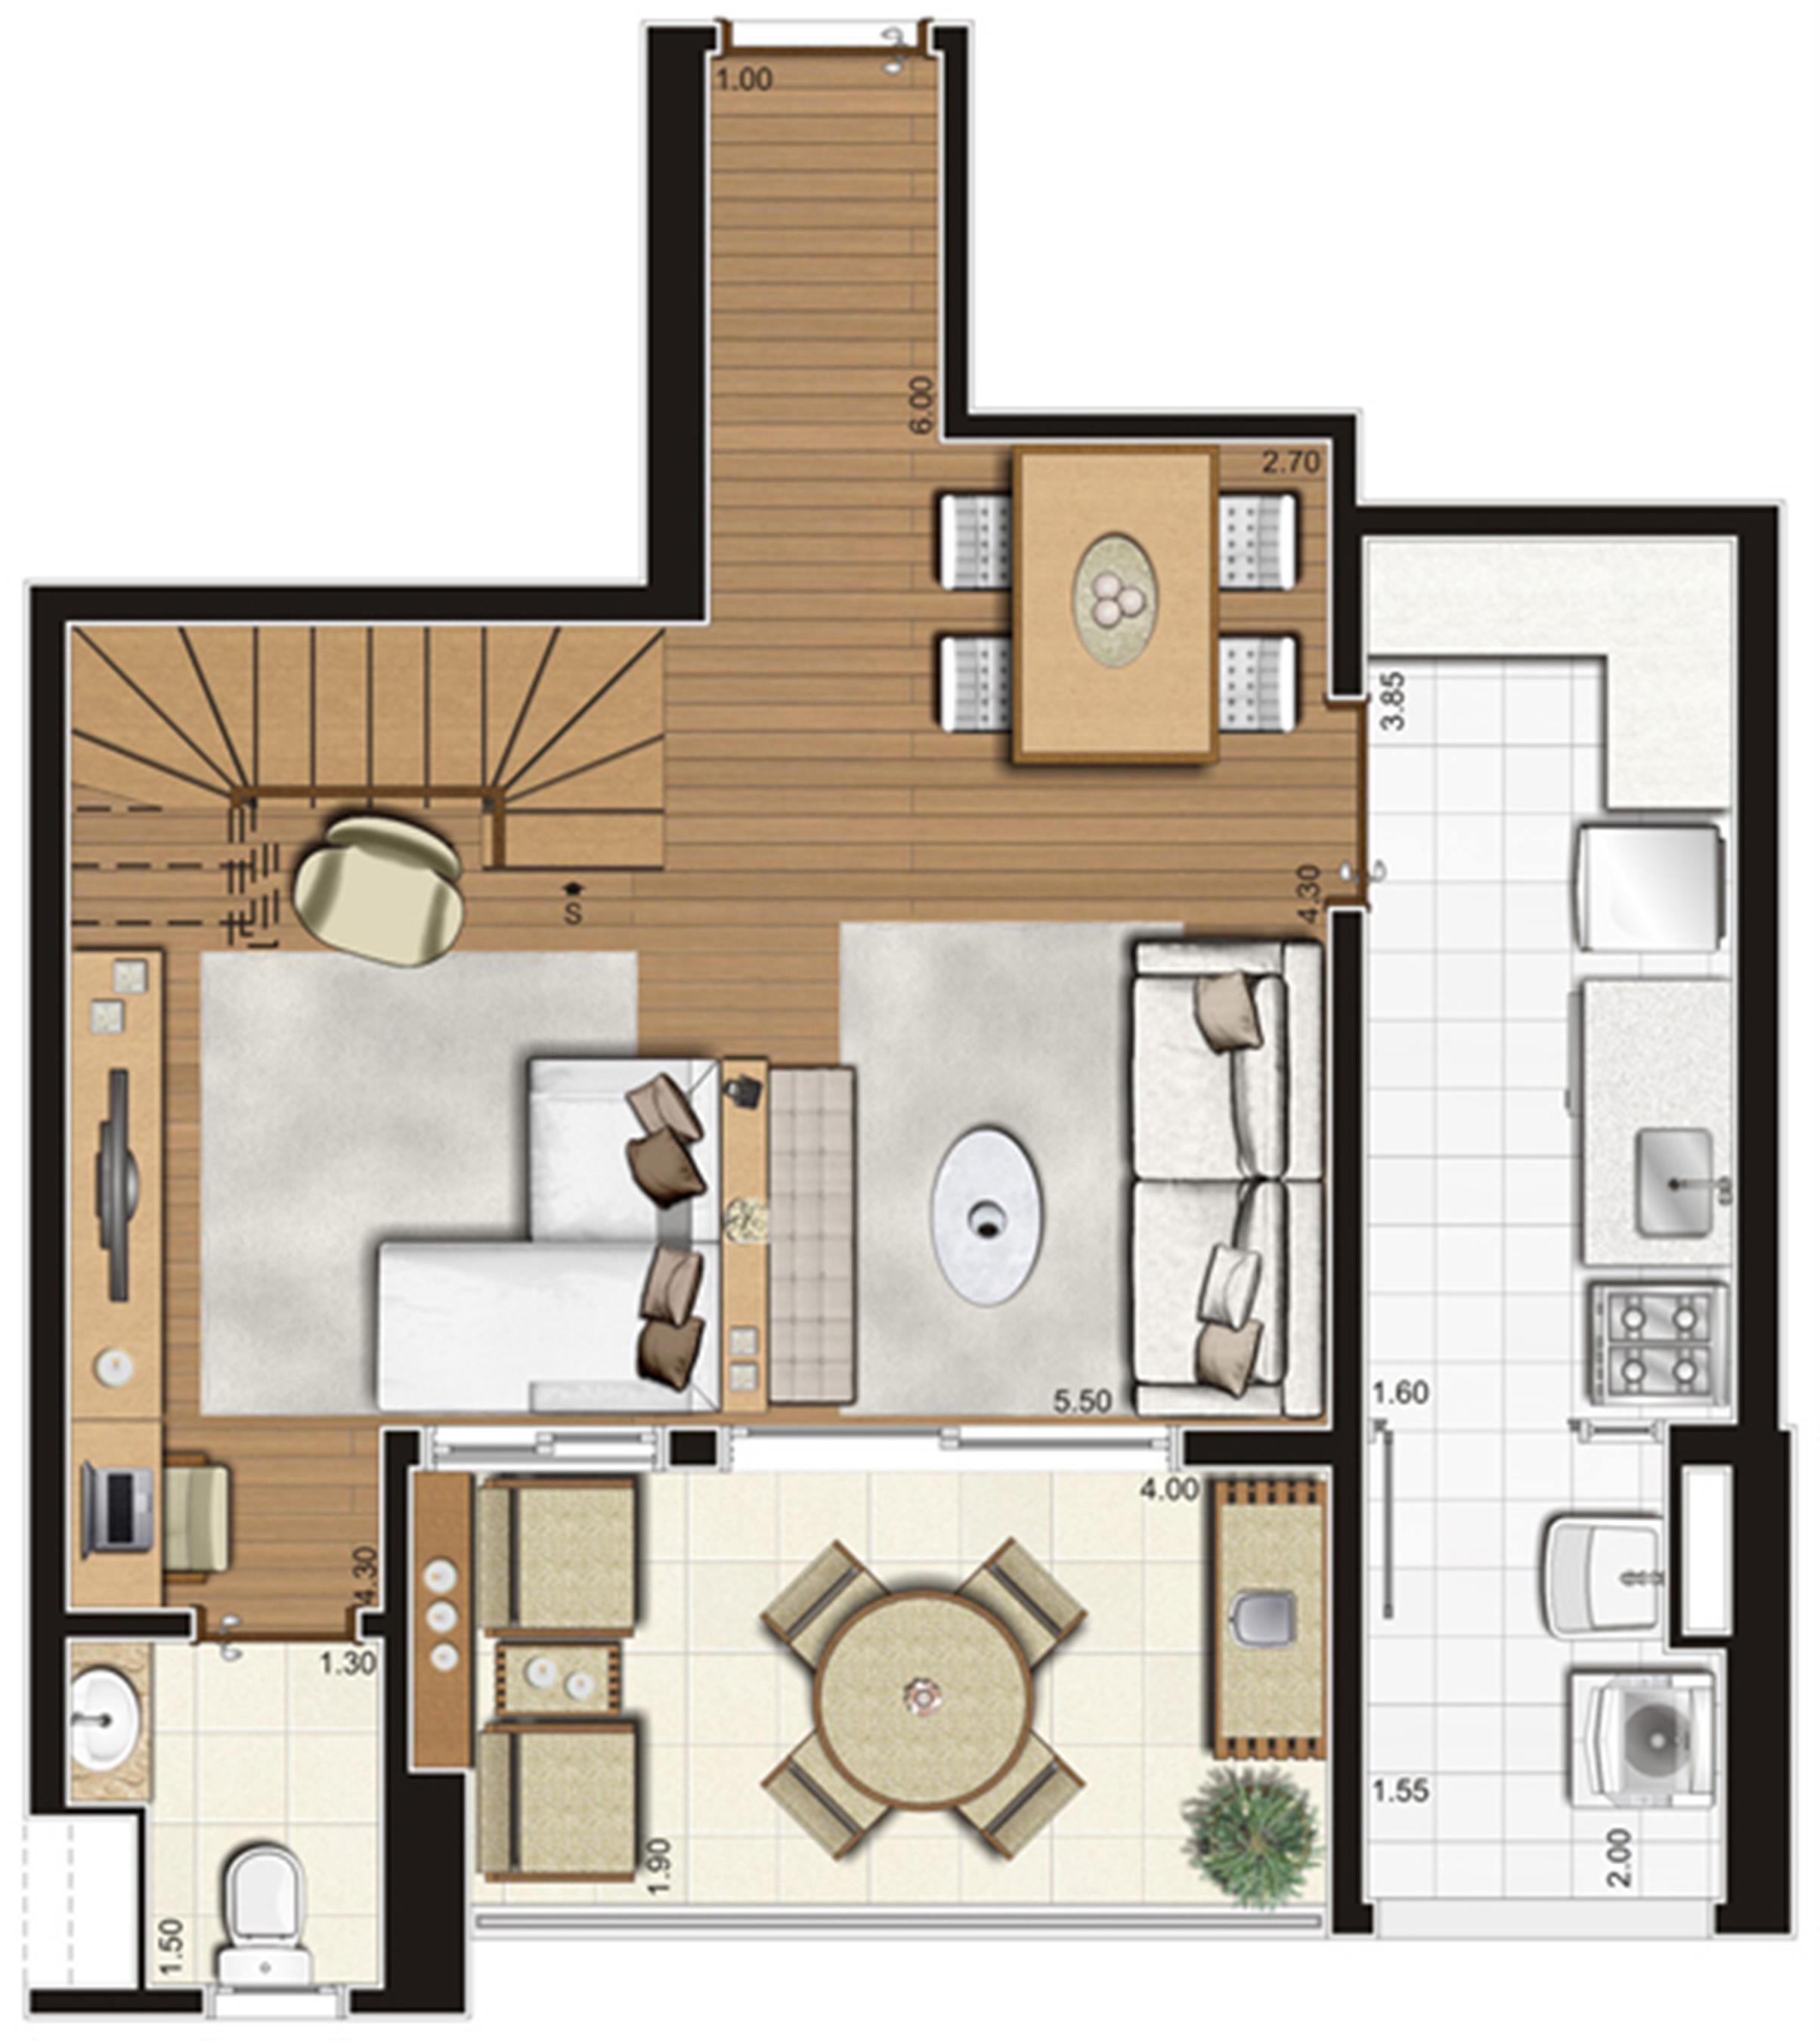 Planta-tipo do pavimento inferior do apartamento duplex de 95 m² privativos, finais 5 e 10   Tempo Bello – Apartamento no  Campo Belo - São Paulo - São Paulo